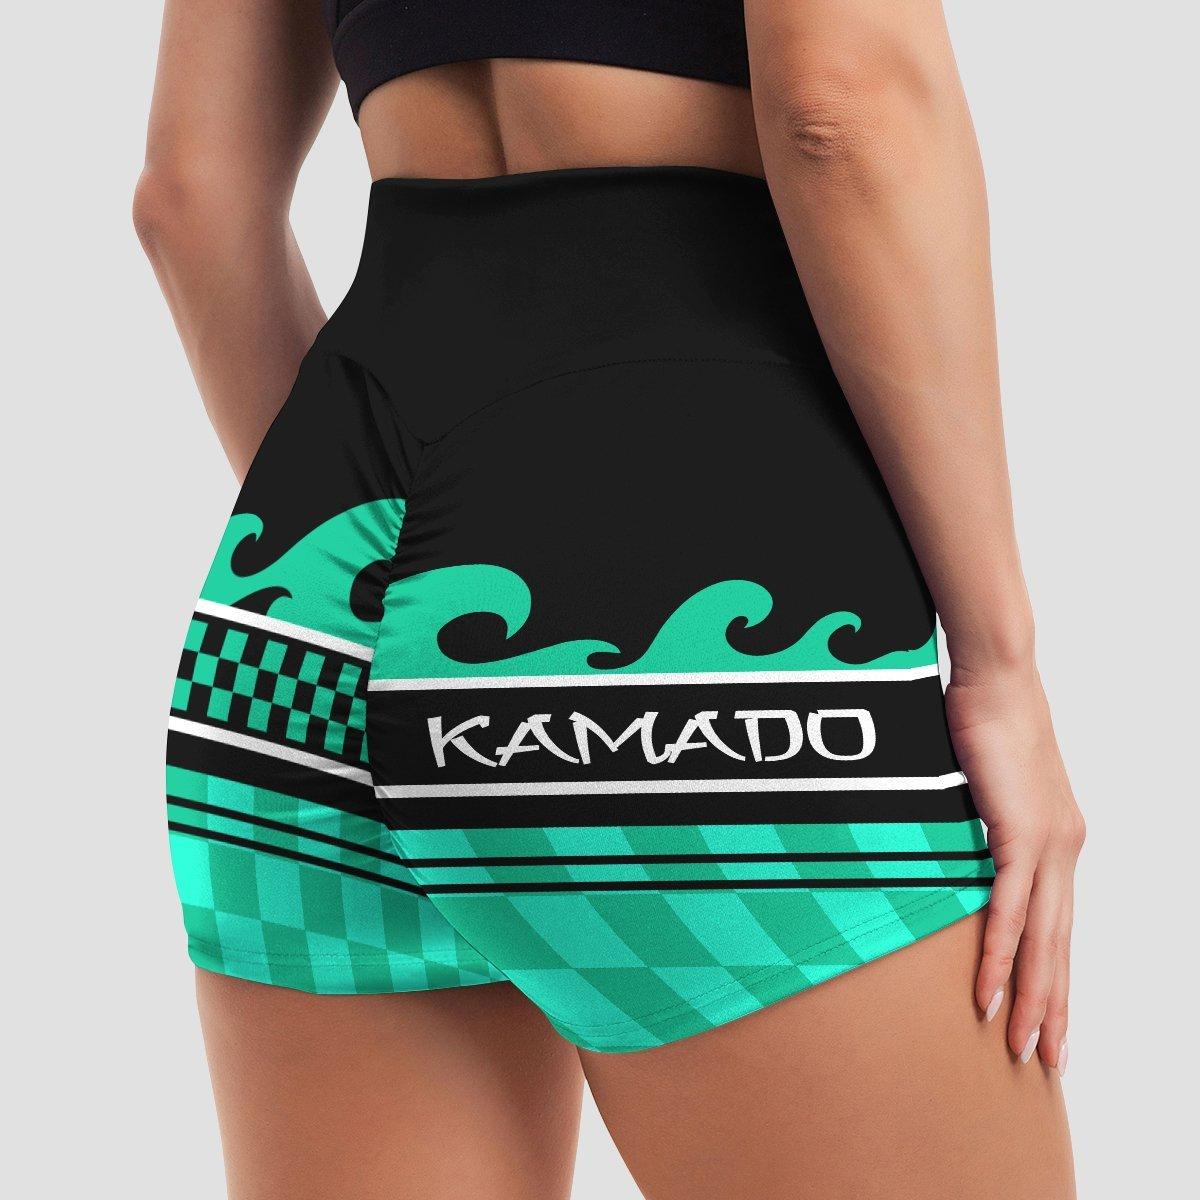 summer tanjiro active wear set 654714 - Anime Swimsuits